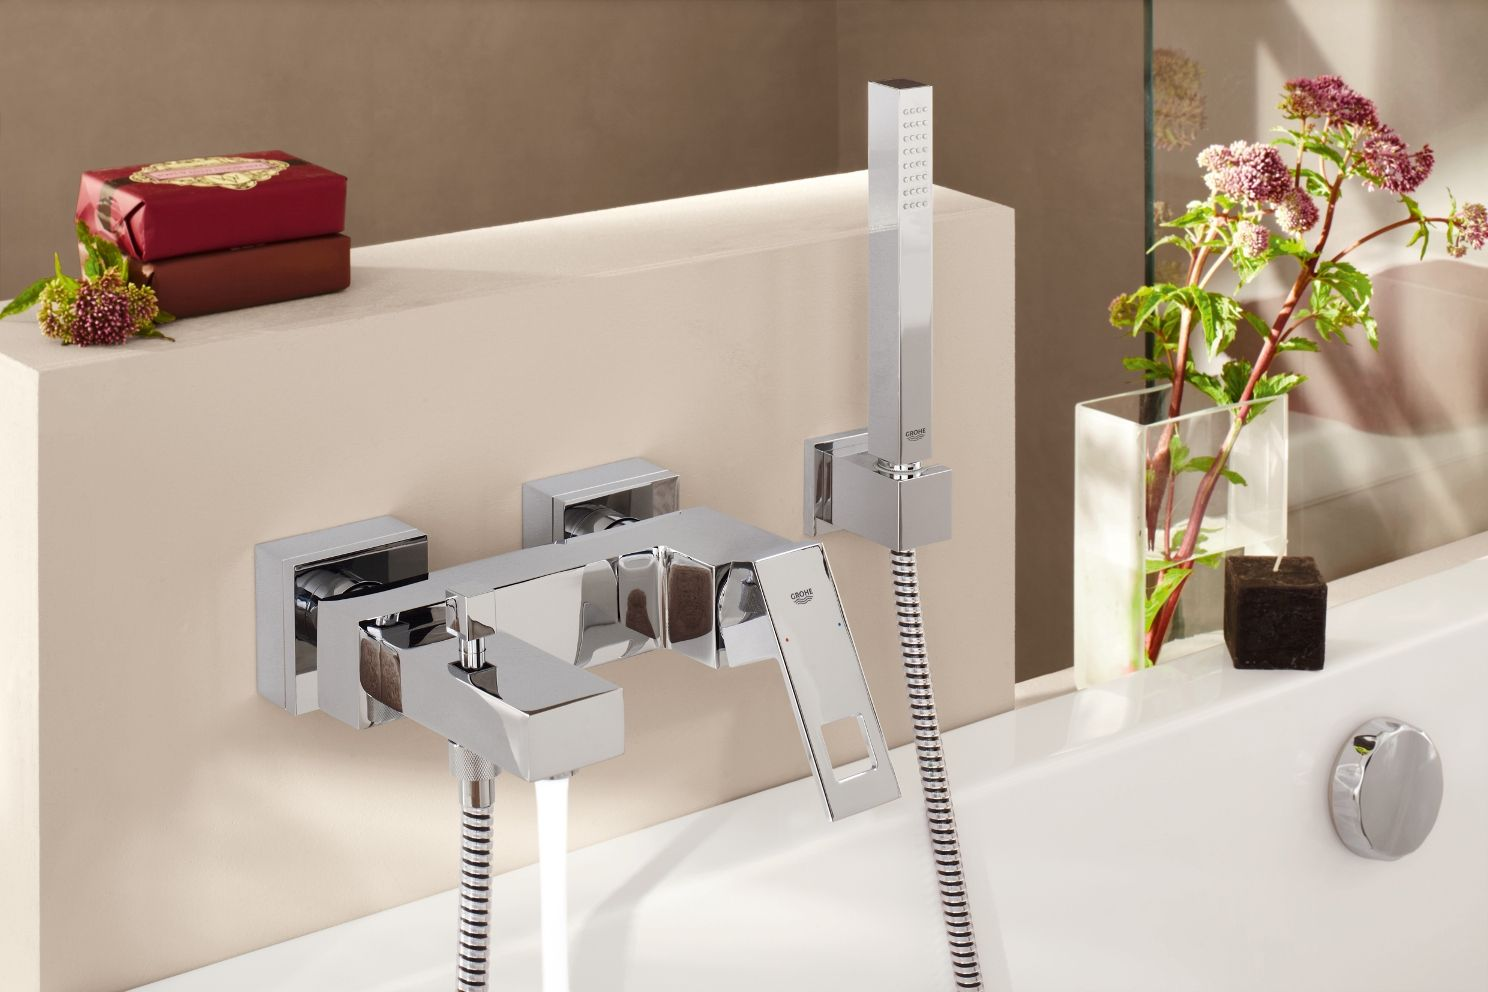 Grohe Grohe Ag Company Page Welcome To Grohe Bath Shower Mixer Bath Mixer Shower Bath